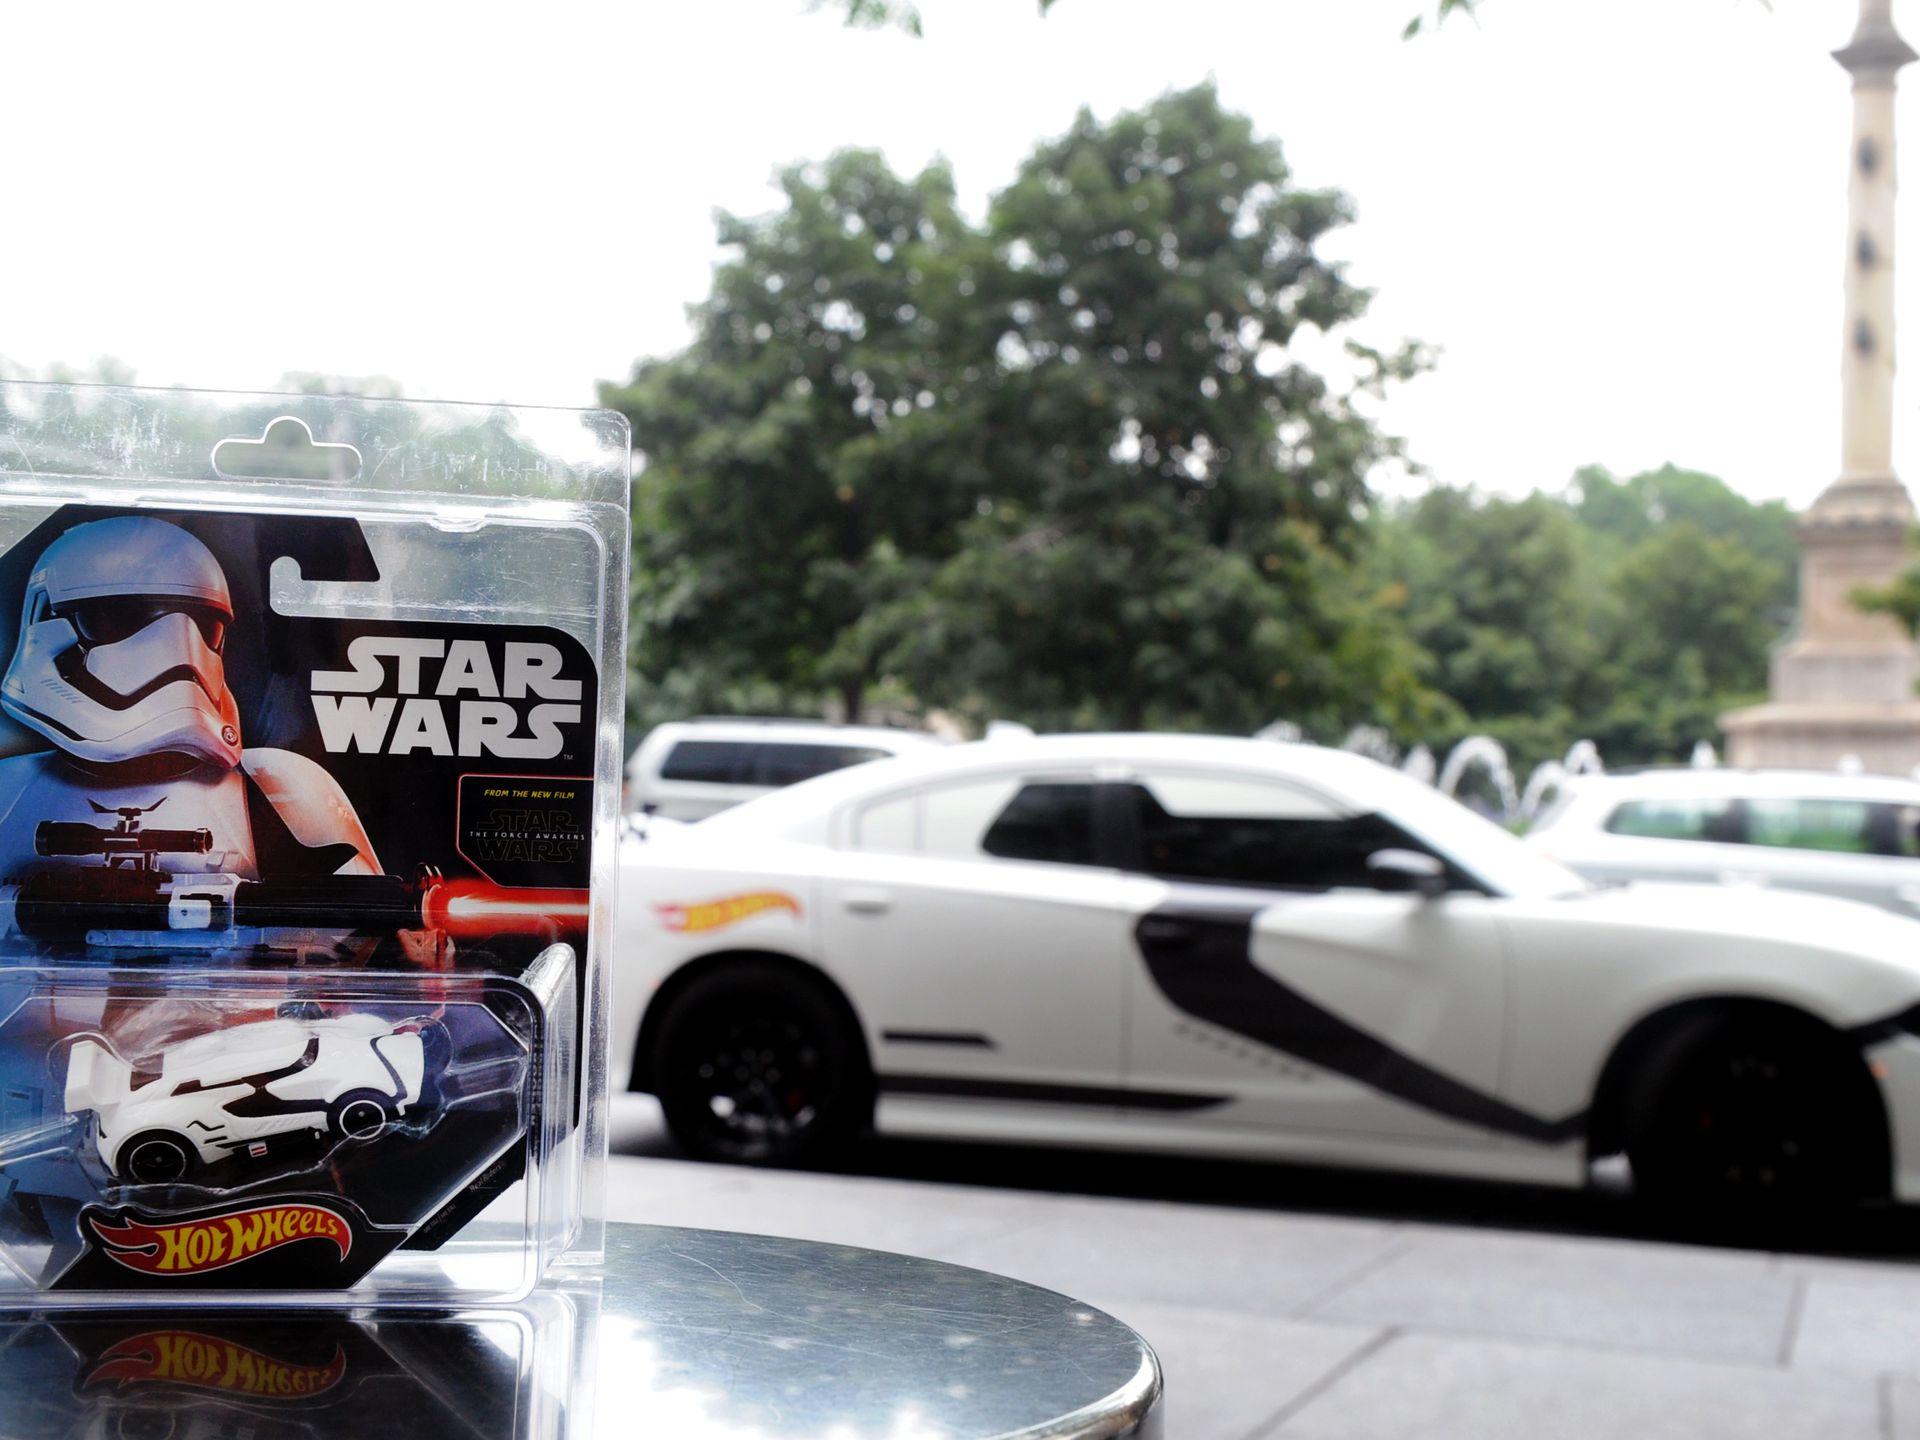 Hot Wheels Goes MOPAR With Star Wars